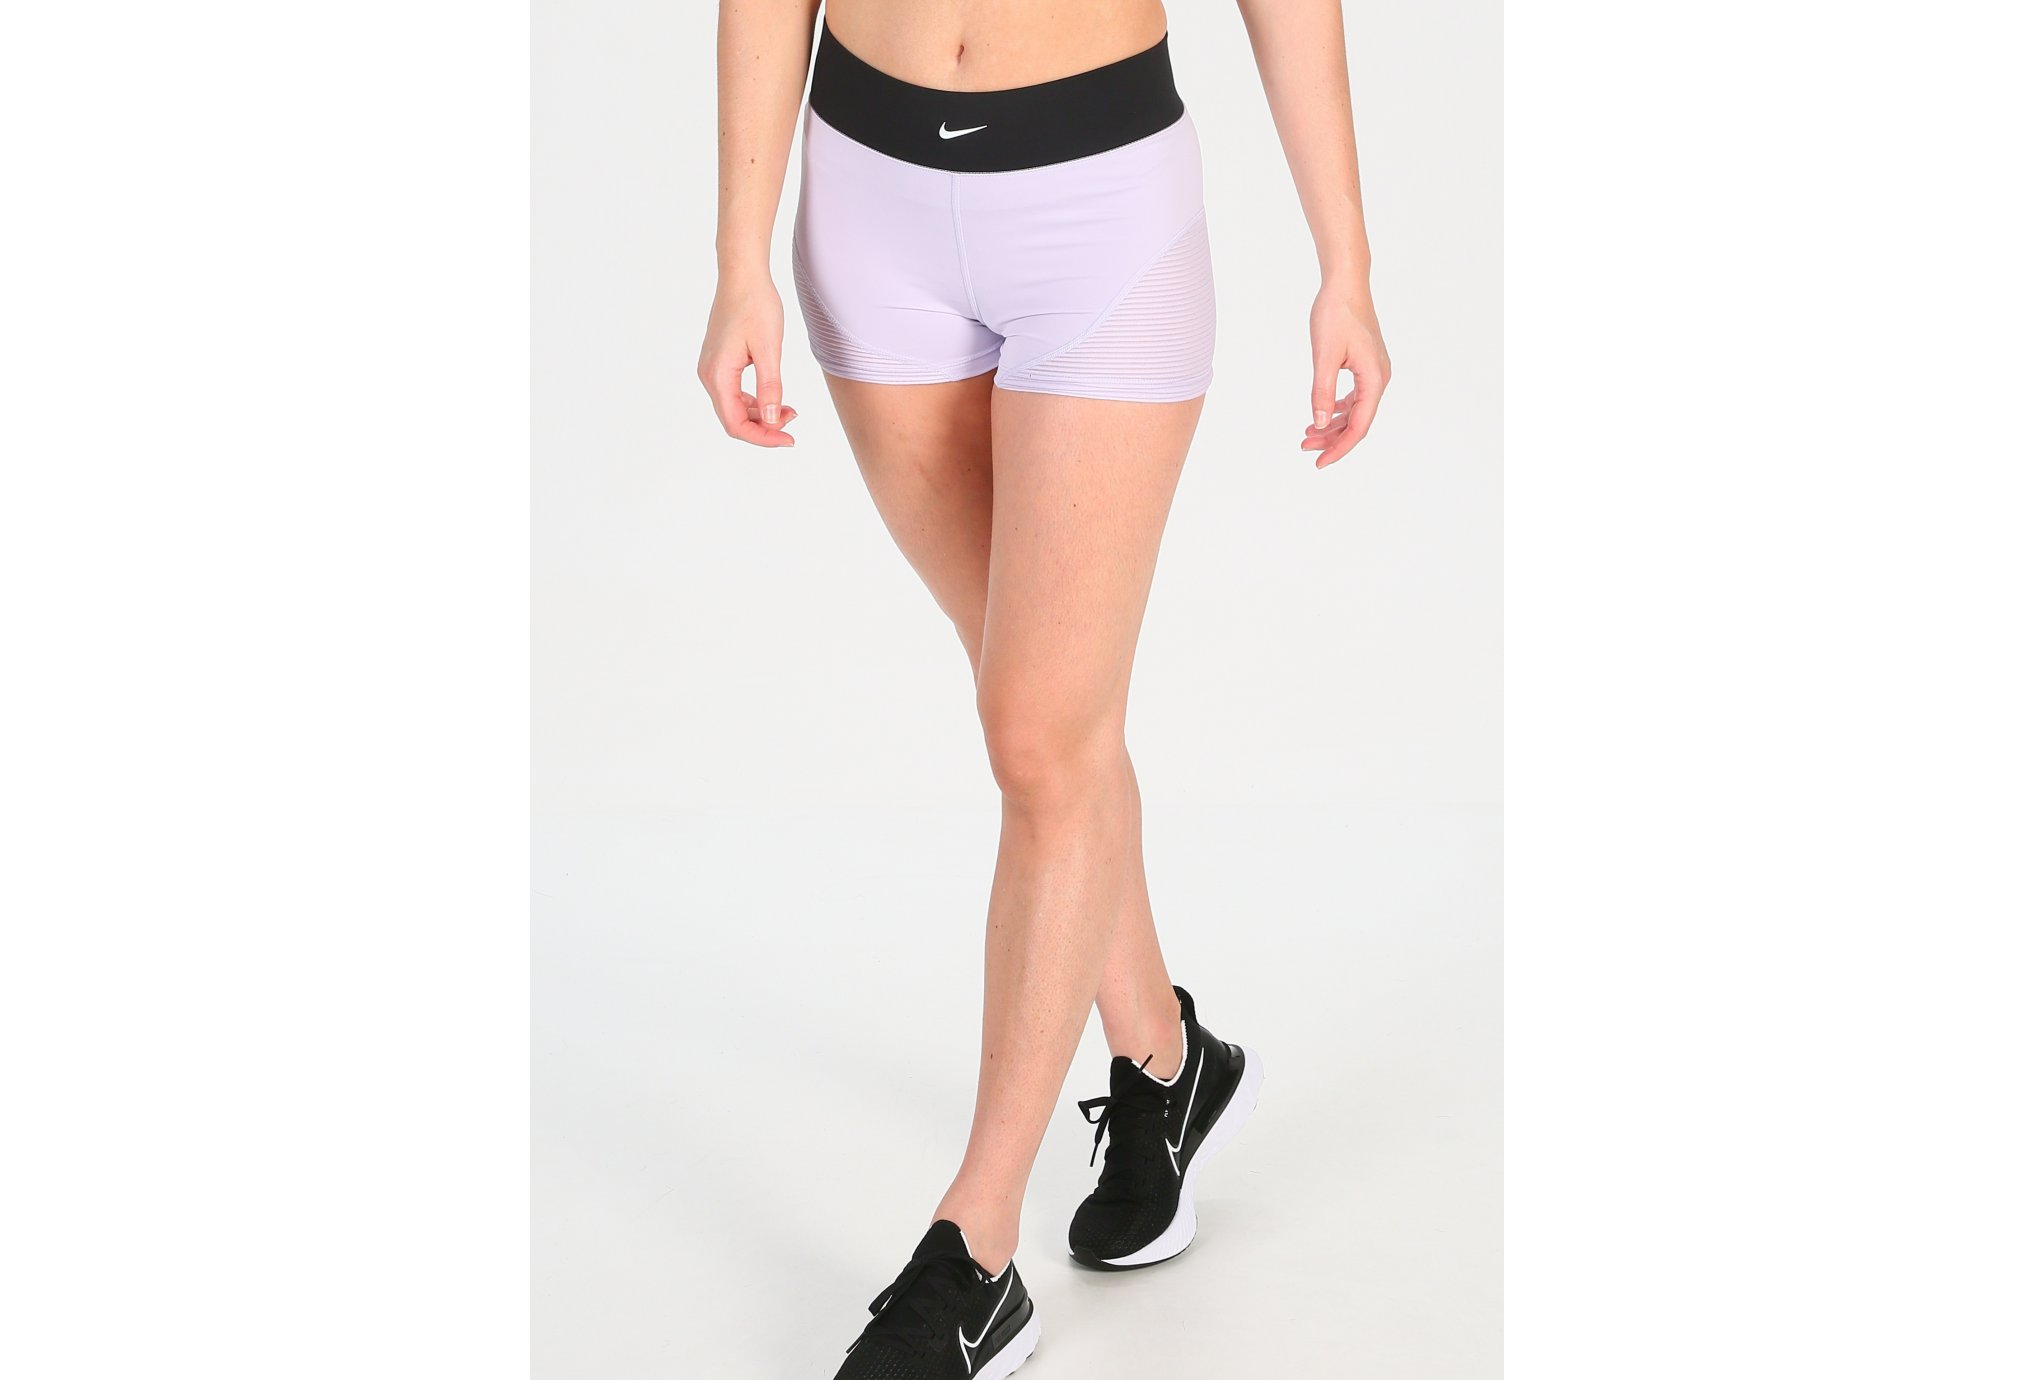 Nike Pro AeroAdapt W Diététique Vêtements femme